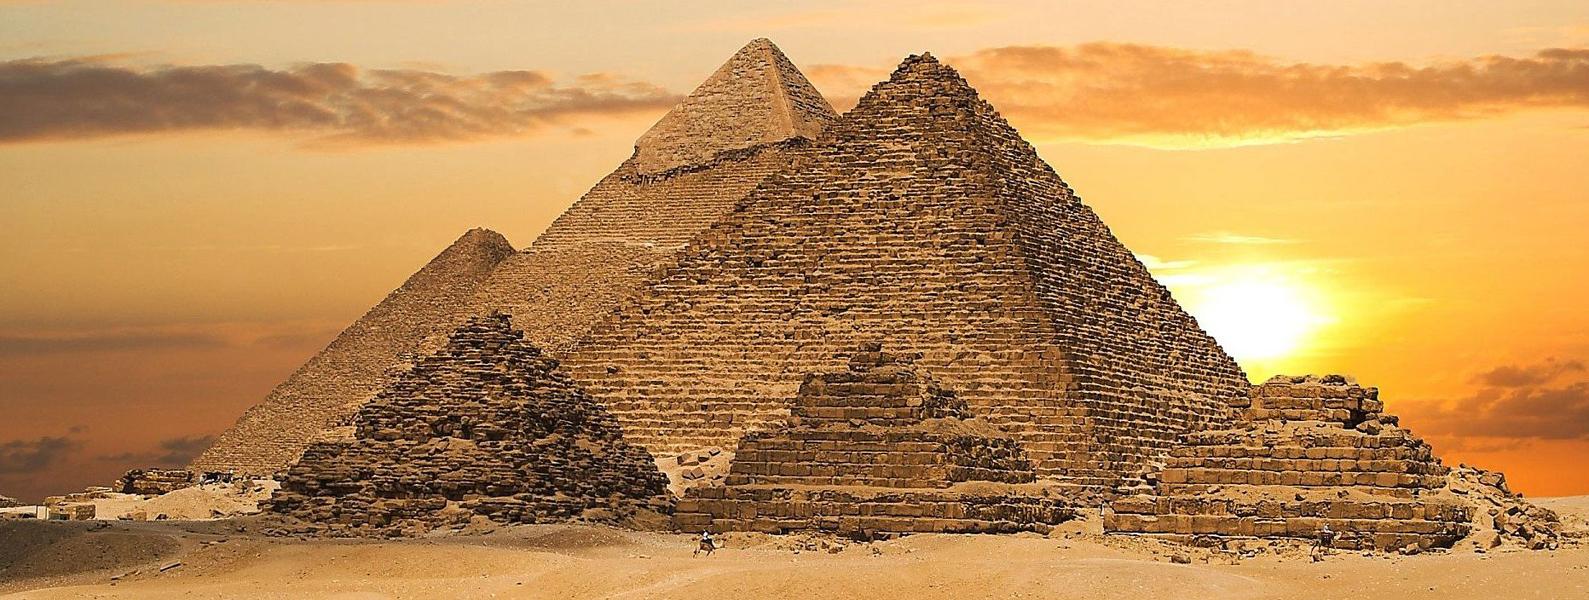 helliq_pyramid06